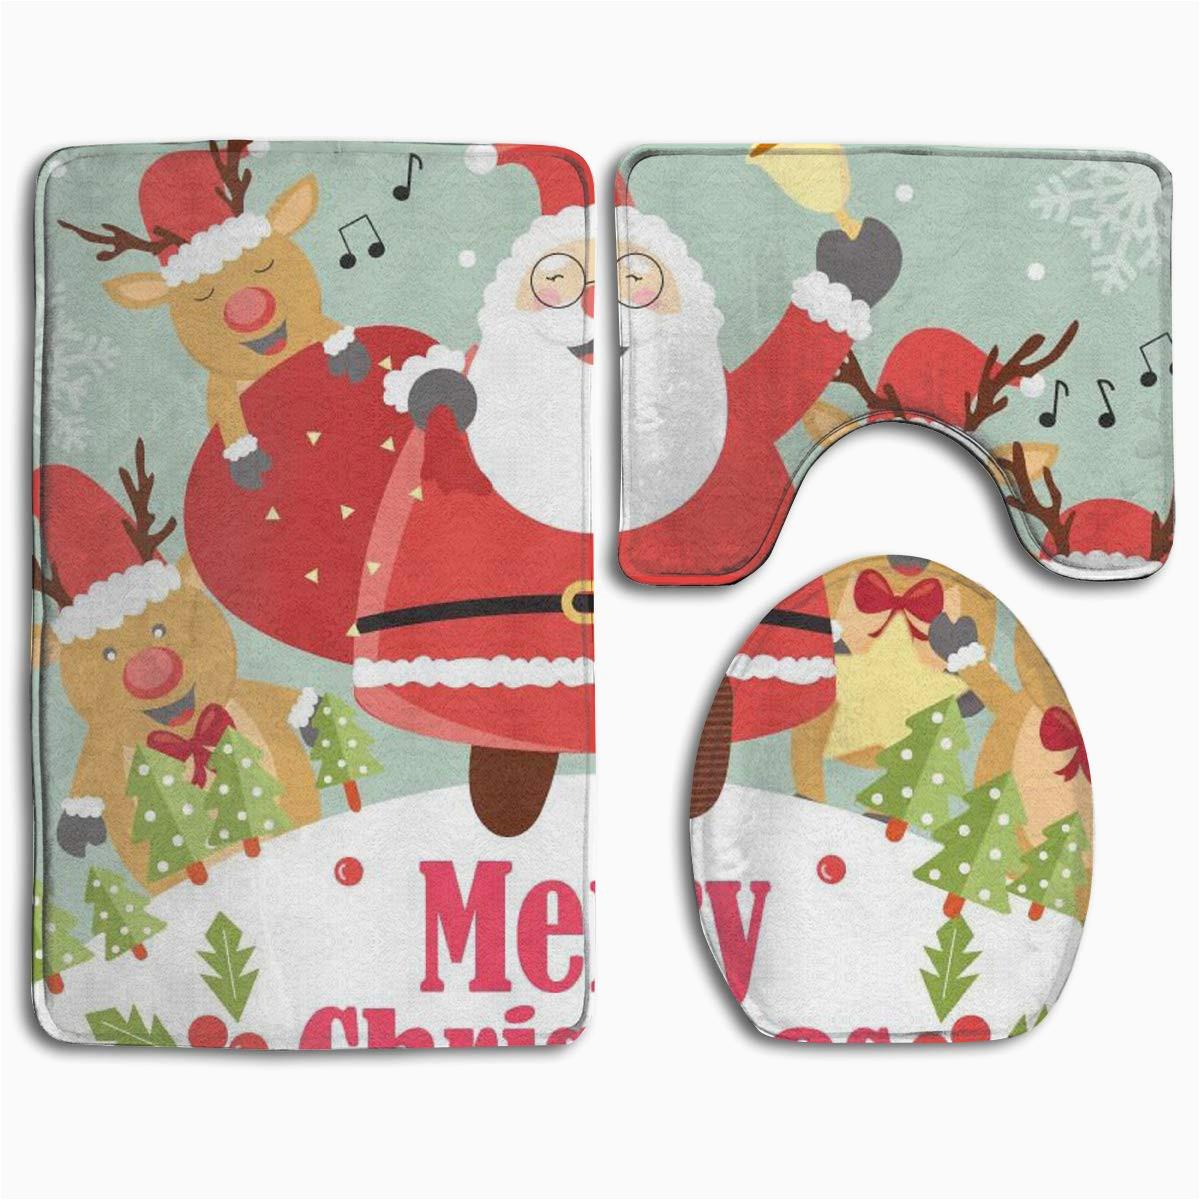 Santa Claus Bathroom Rugs Gohao Christmas Santa Claus 3 Piece Bathroom Rugs Set Bath